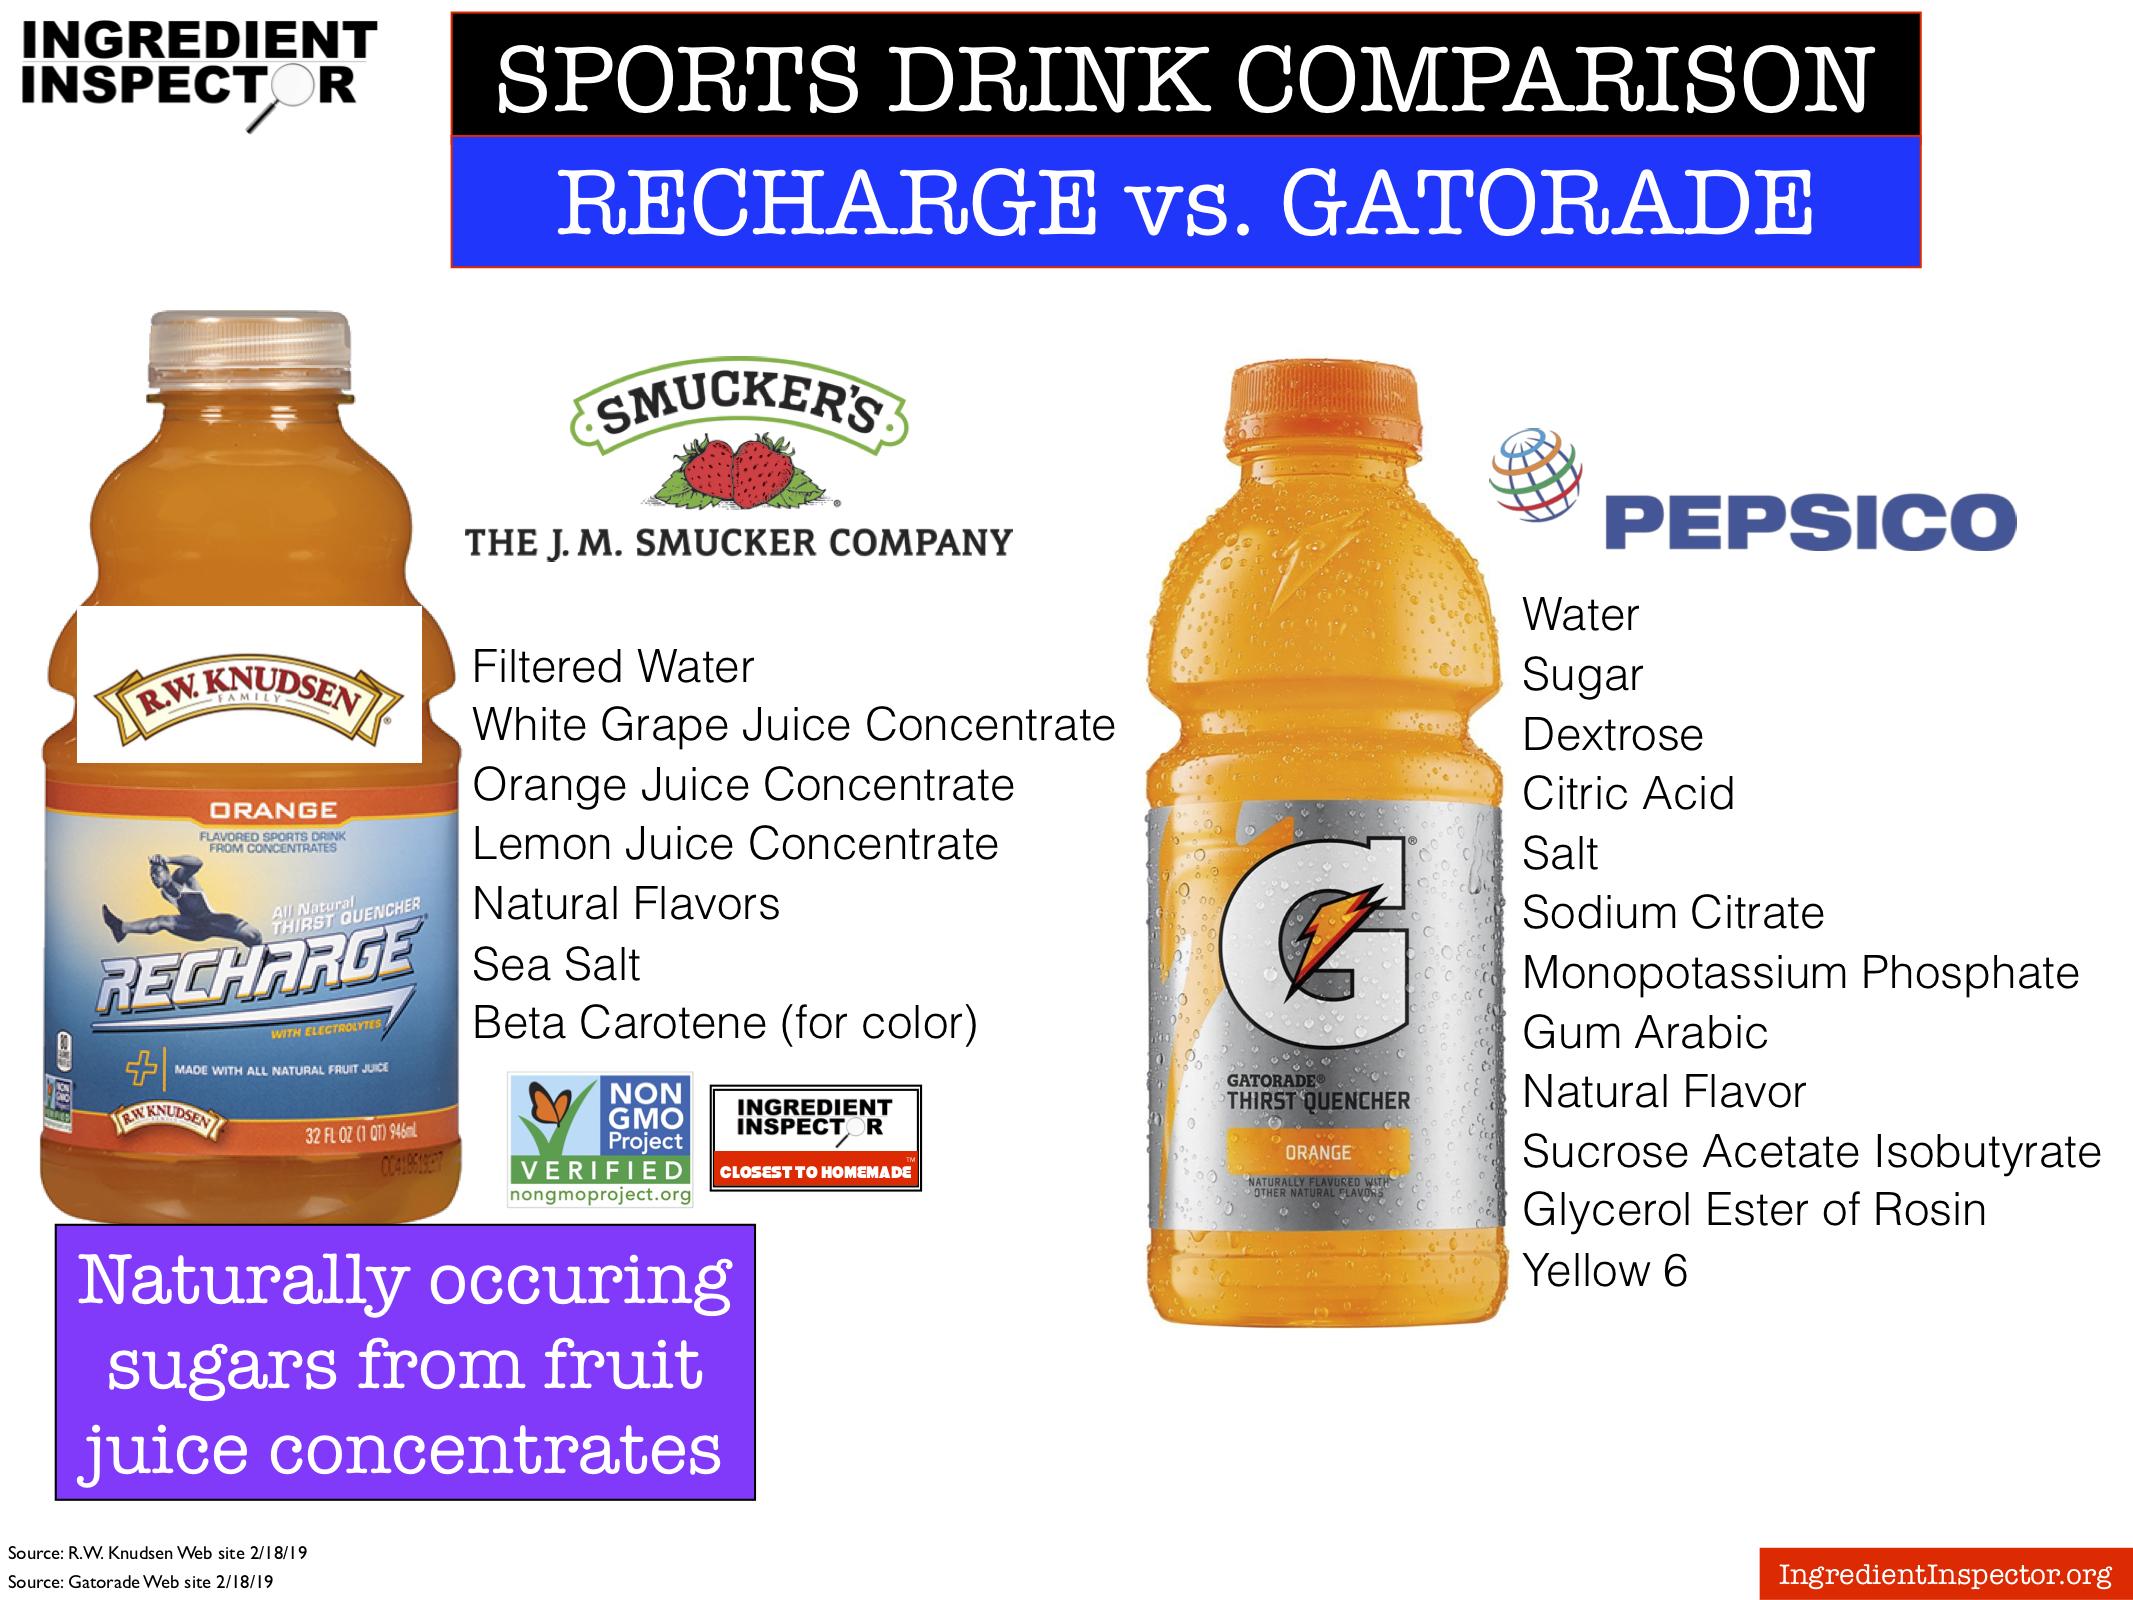 Ingredient Inspector Sports Drink Comparison Recharge vs. Gatorade.jpg